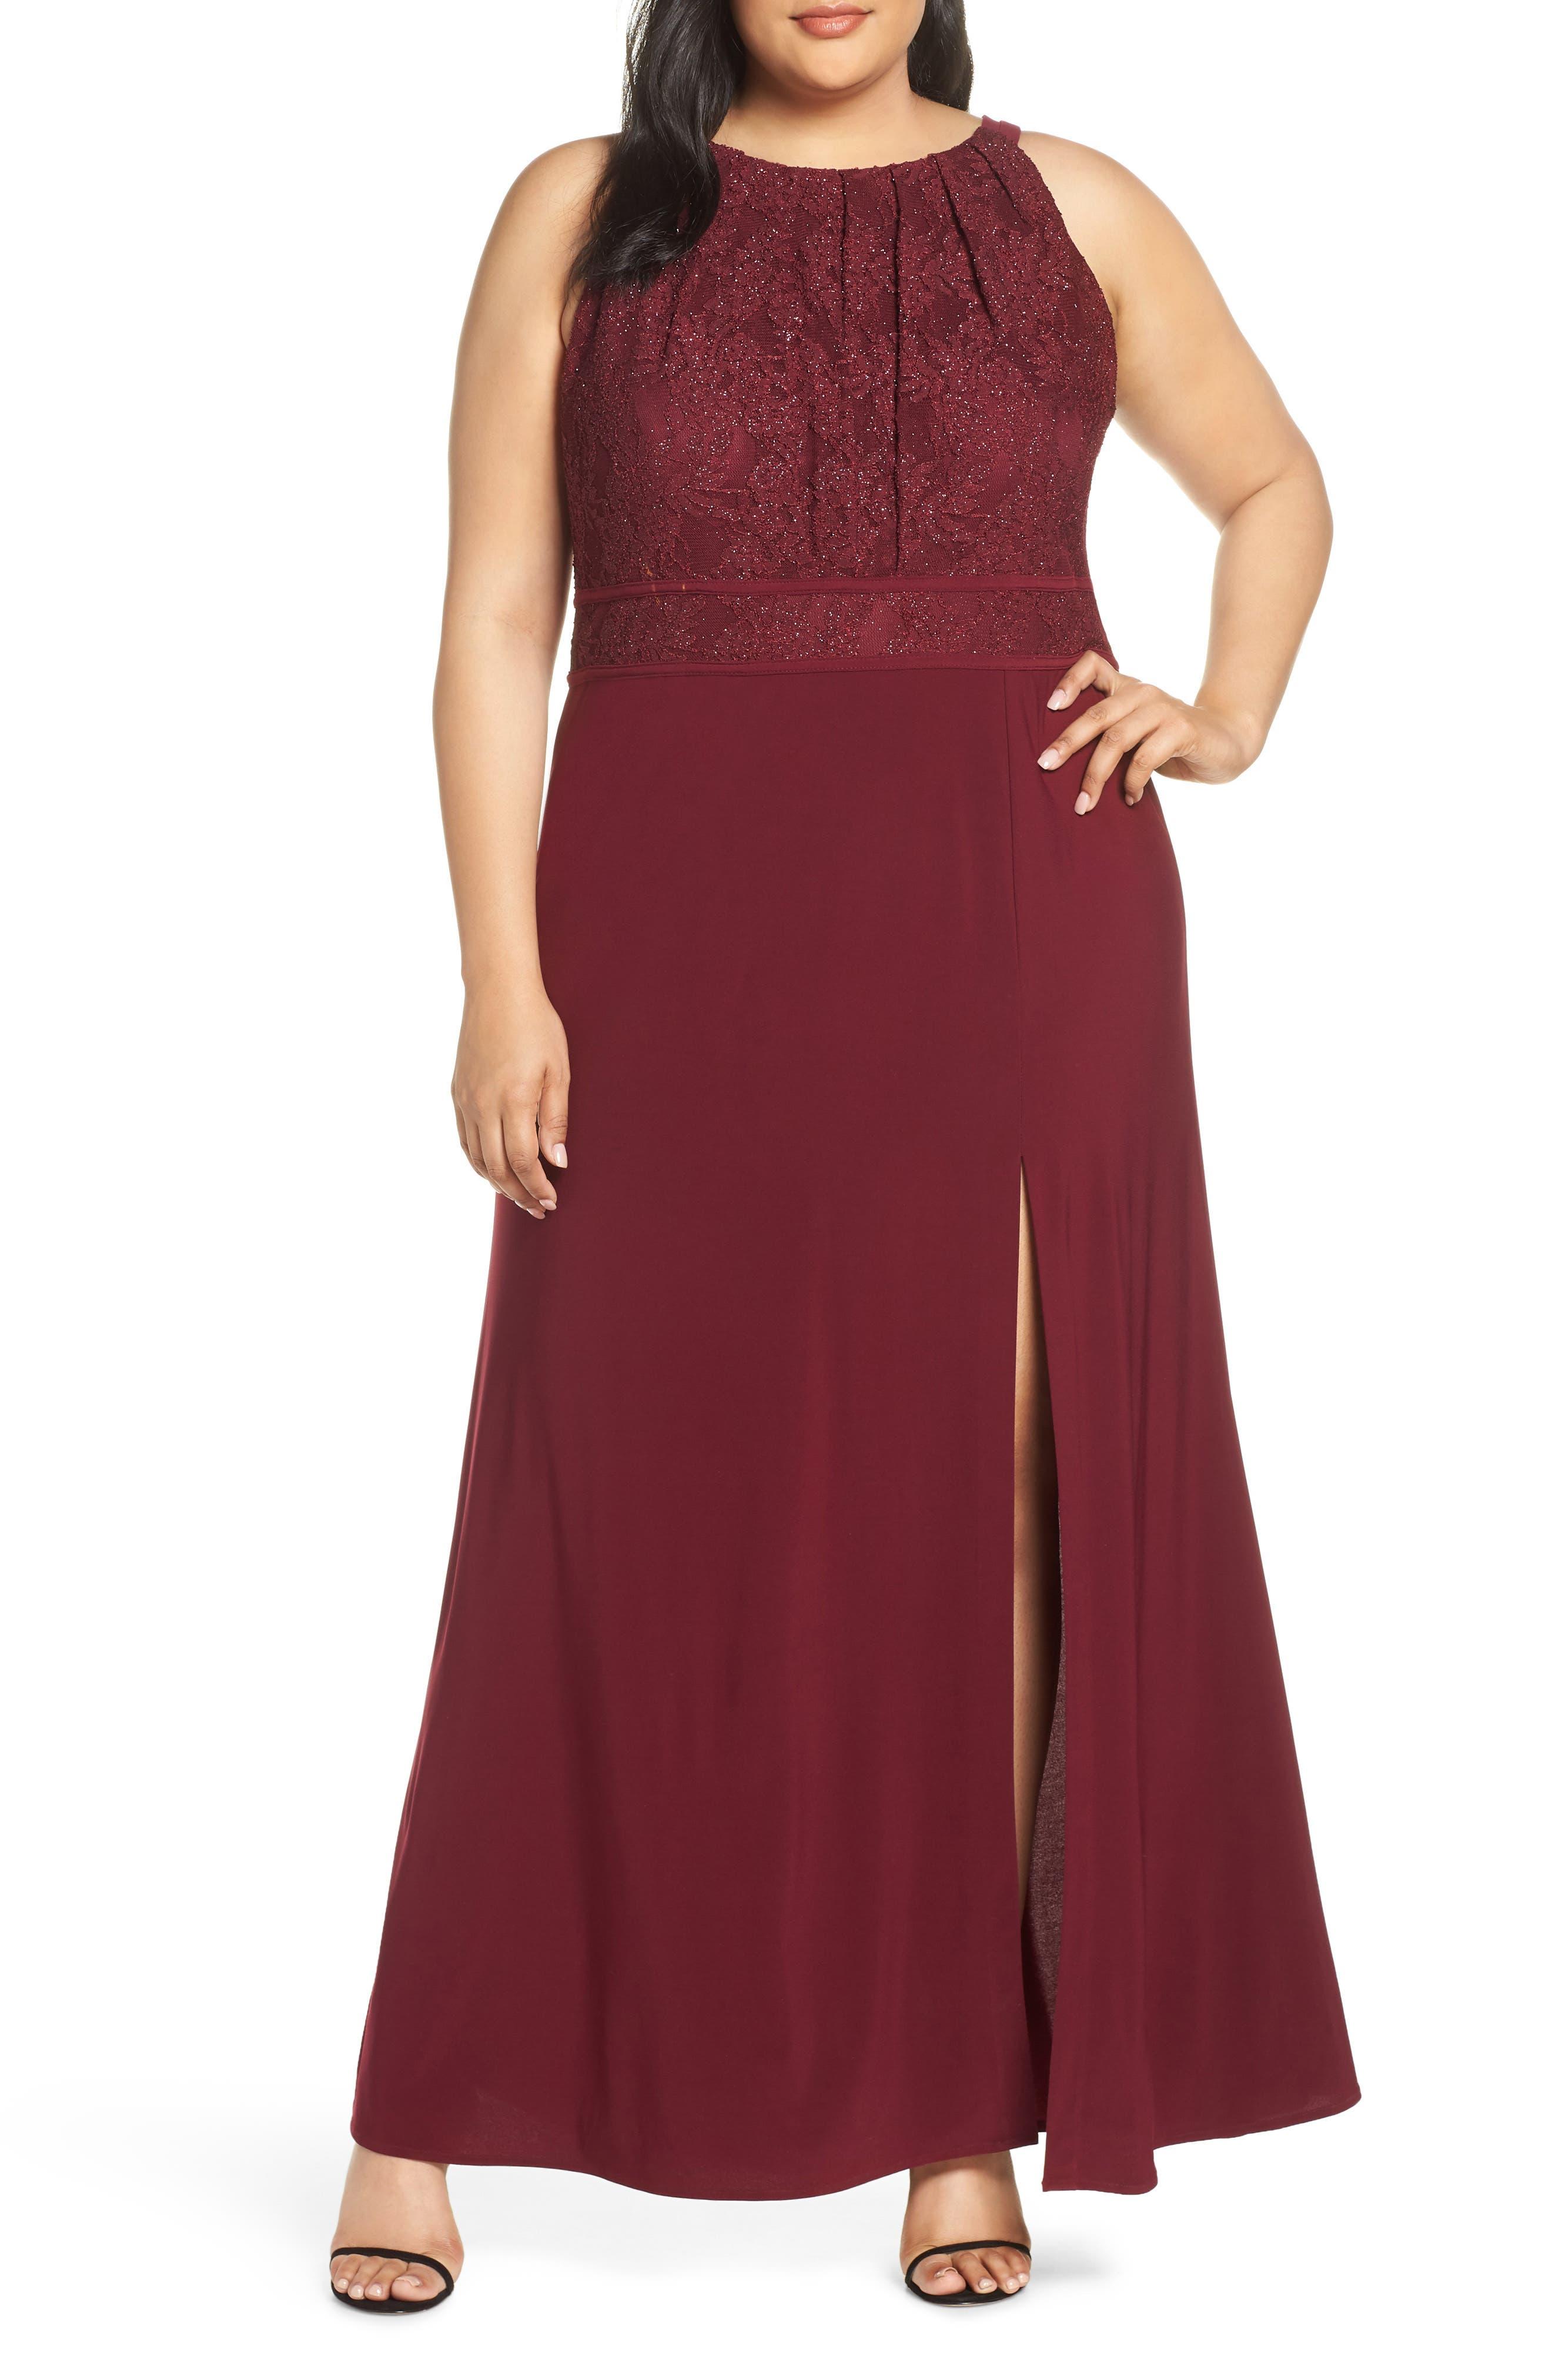 Plus Size Morgan & Co. Pleat Lace Bodice Evening Dress, Burgundy